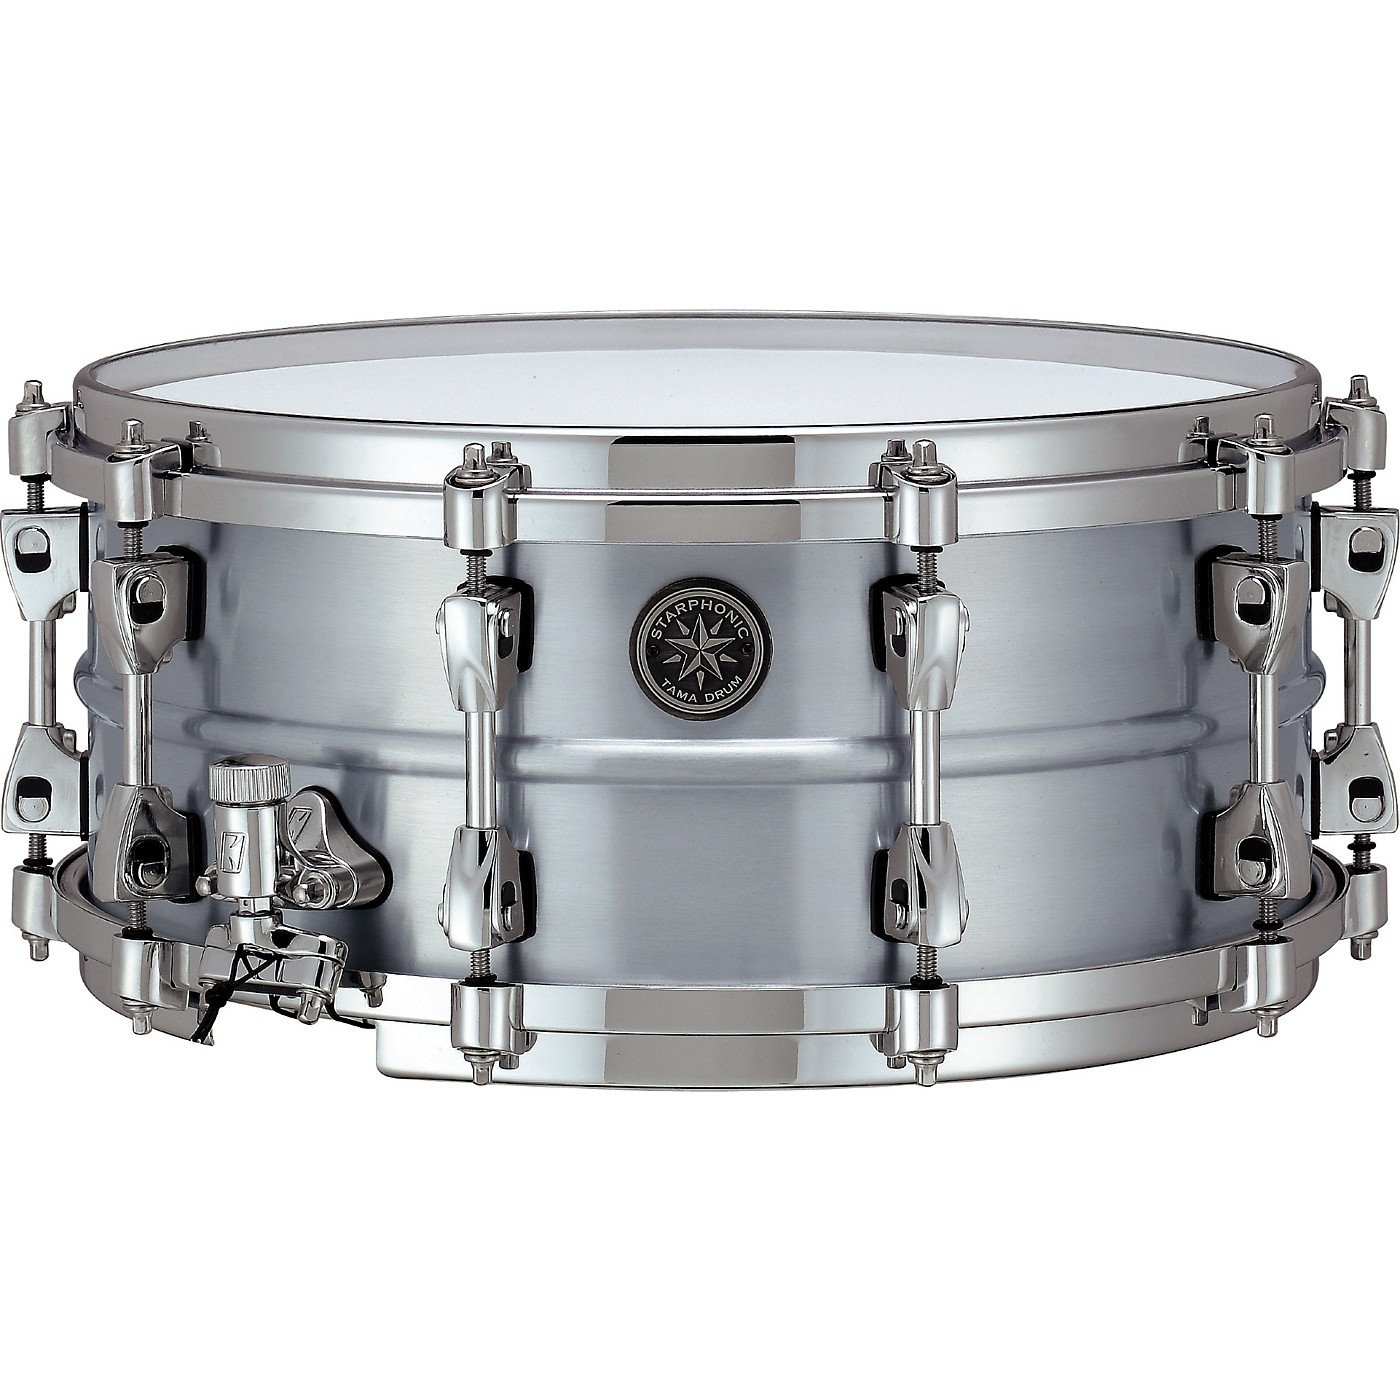 TAMA Starphonic Snare Drum thumbnail